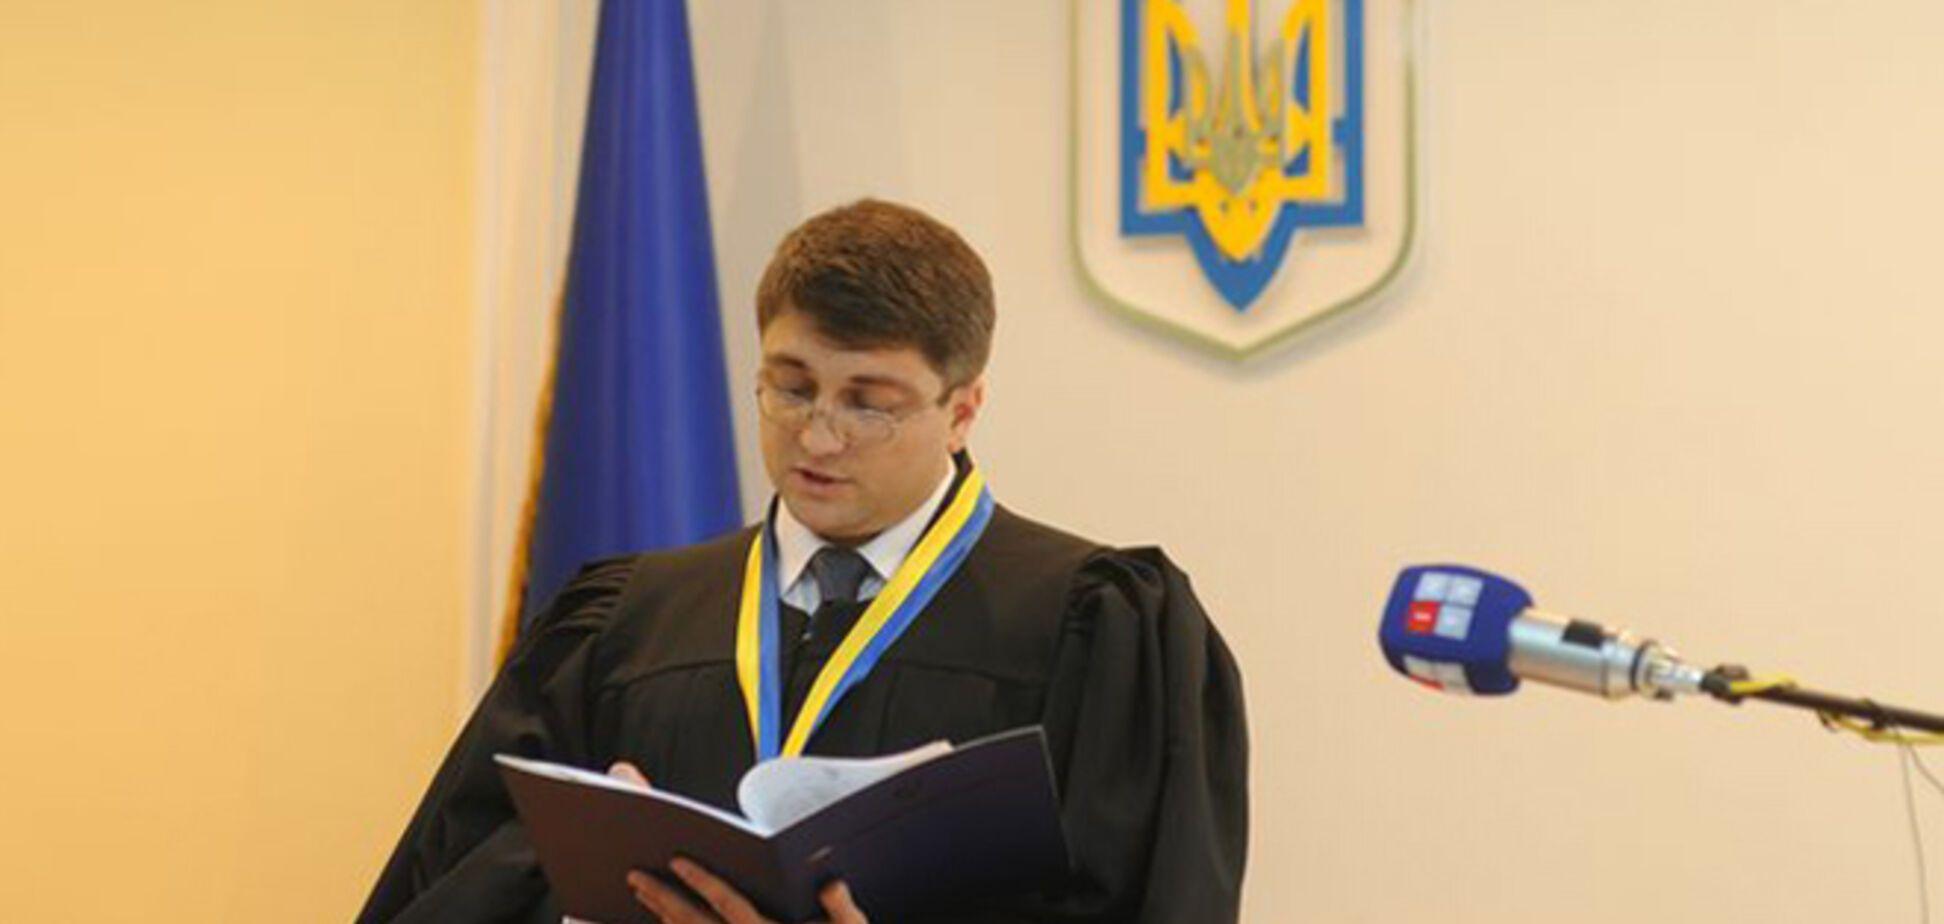 ГПУ объявила в розыск судью Киреева